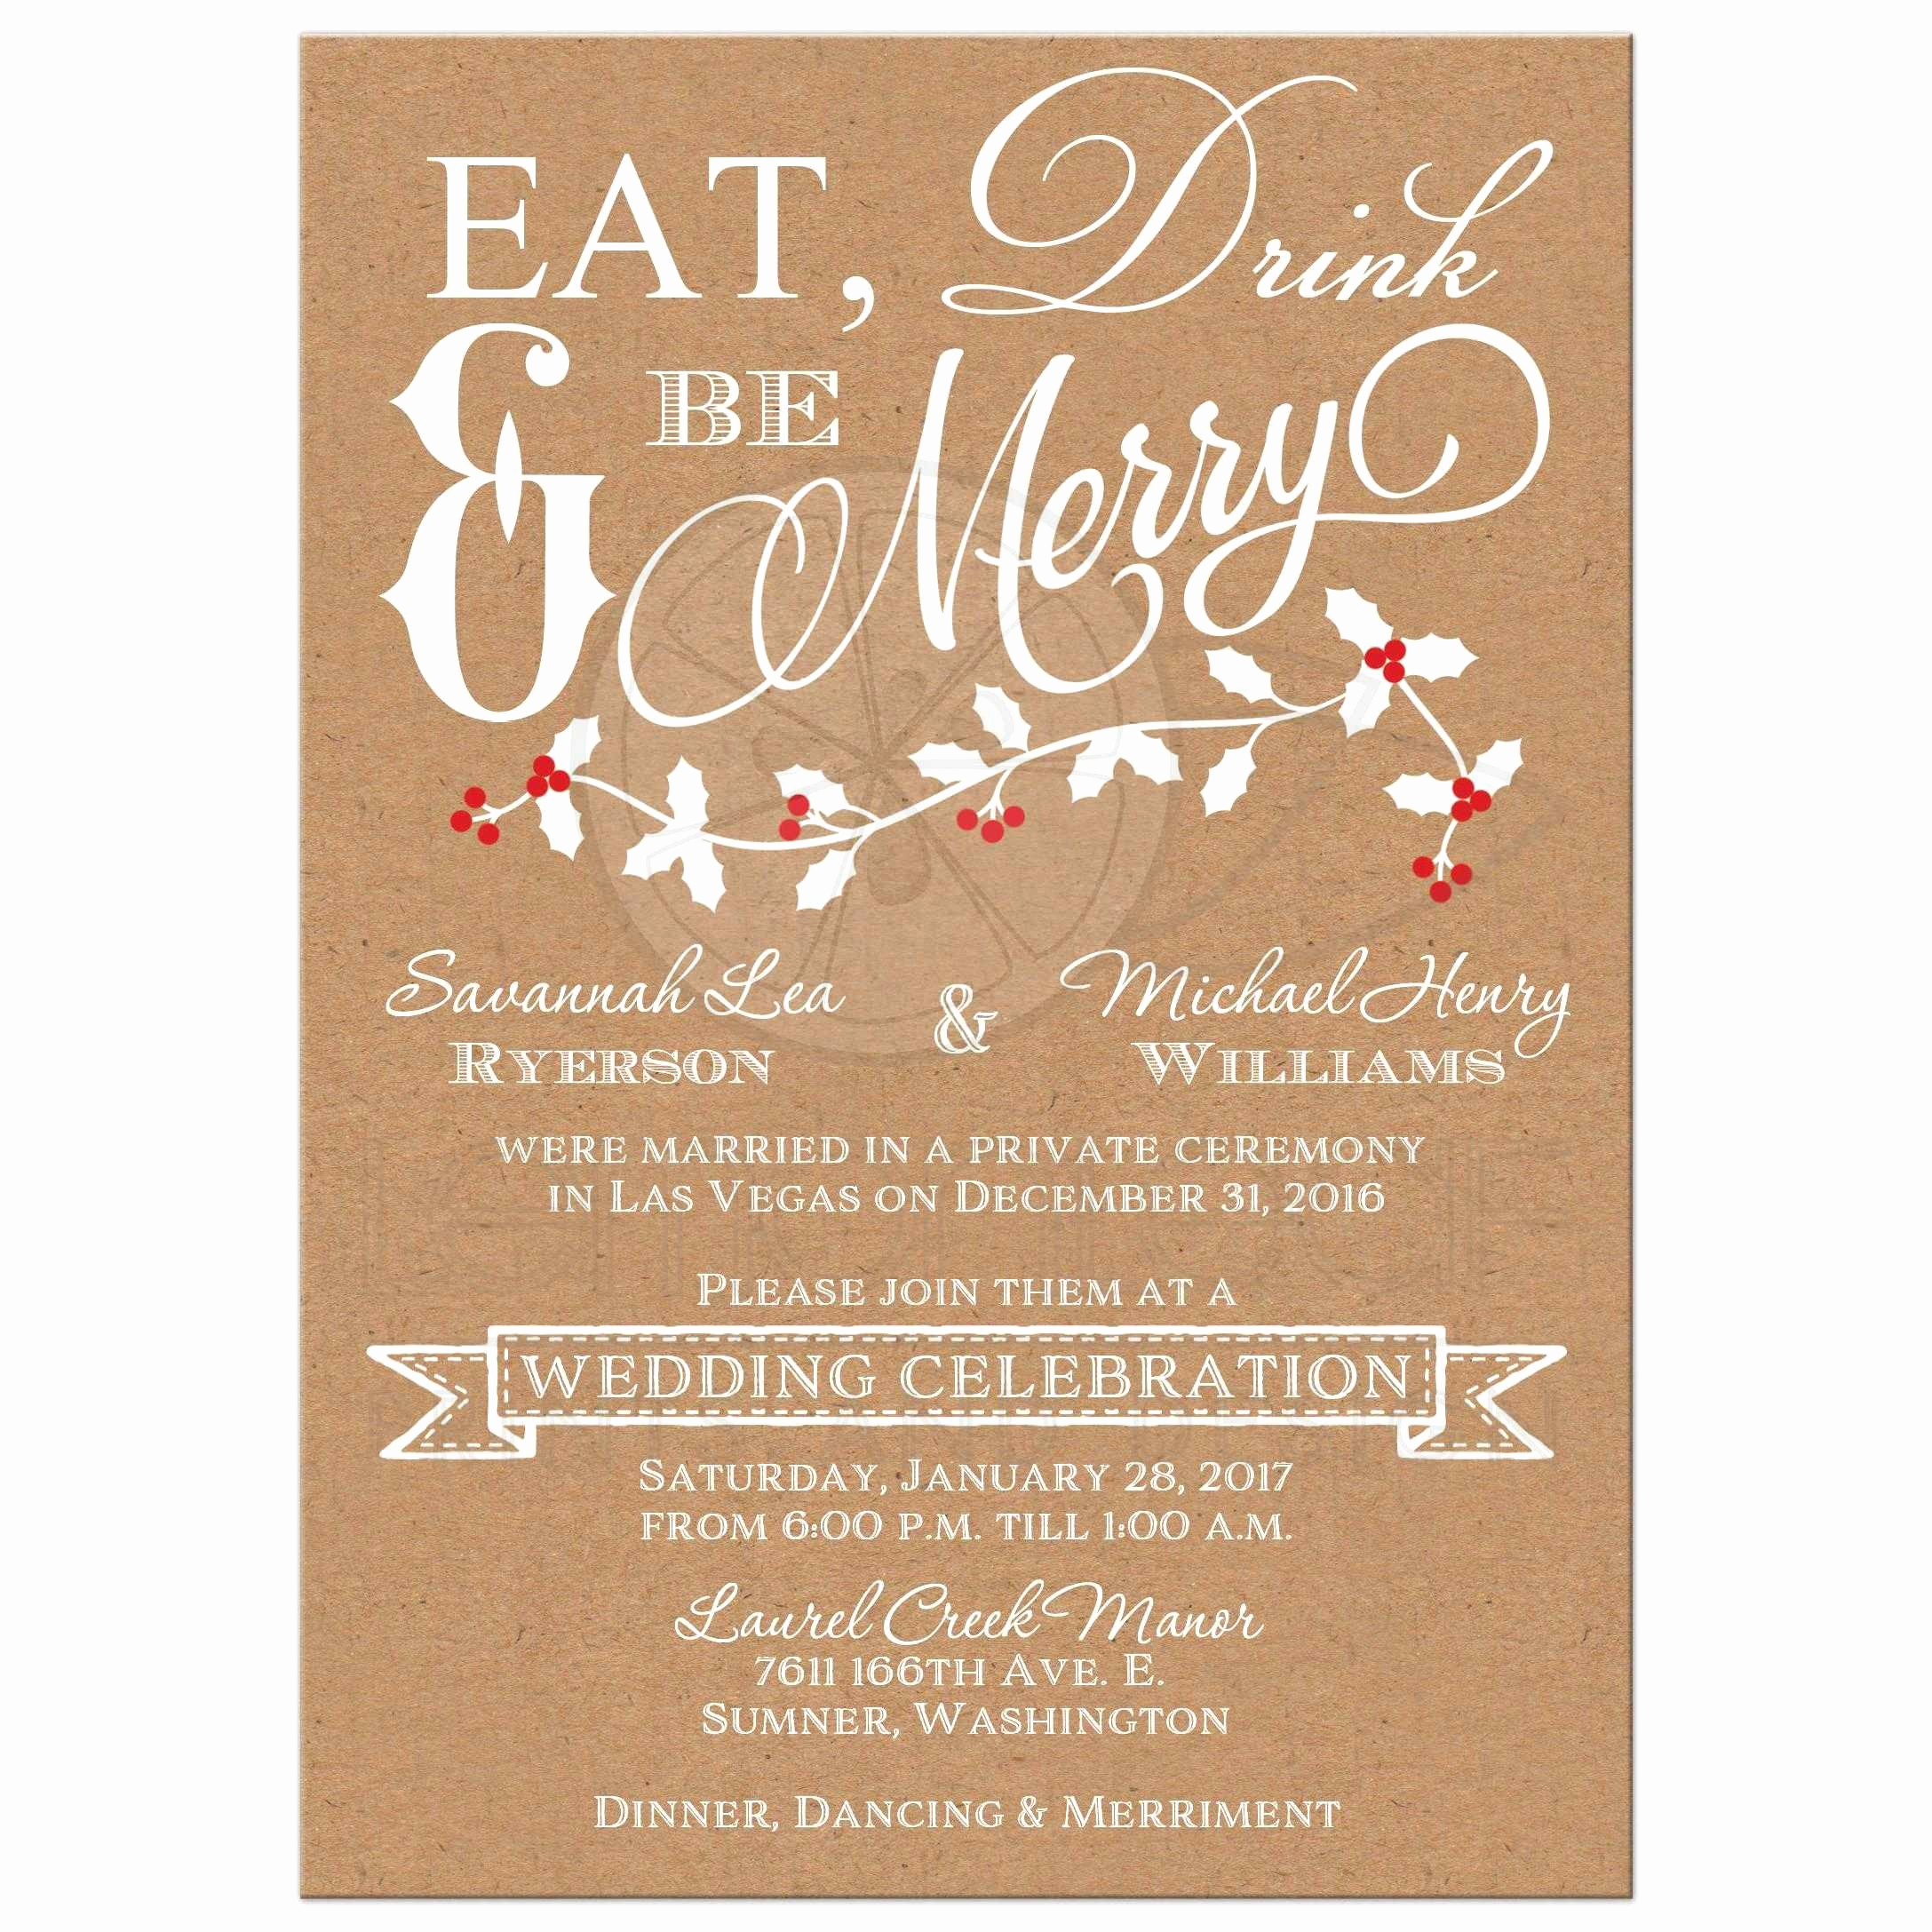 Wedding Reception Invitation Templates Beautiful Winter Wedding Reception Invitation